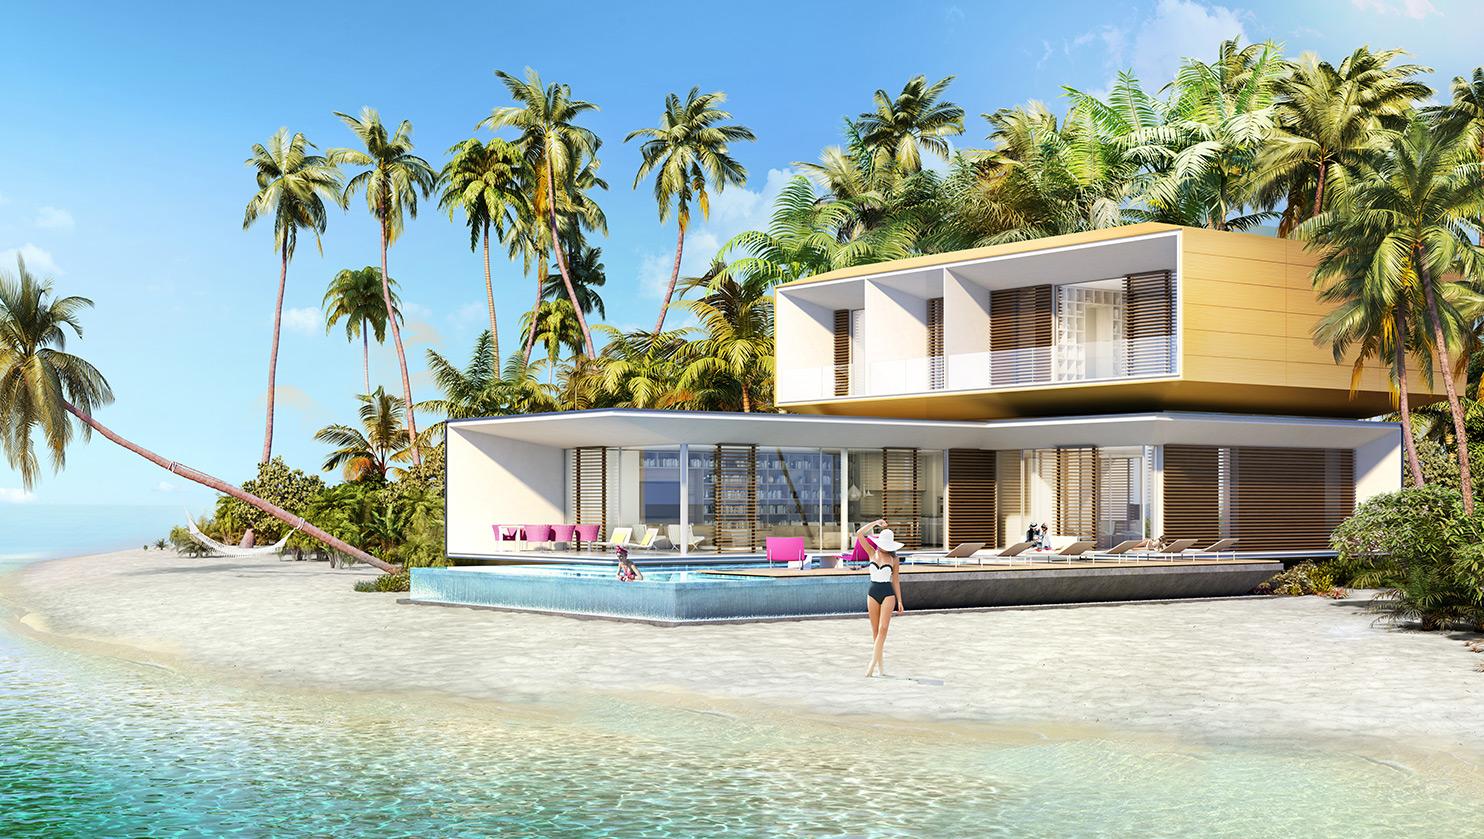 GERMANY VILLAS | Real Estate Project in UAE, -Dubai